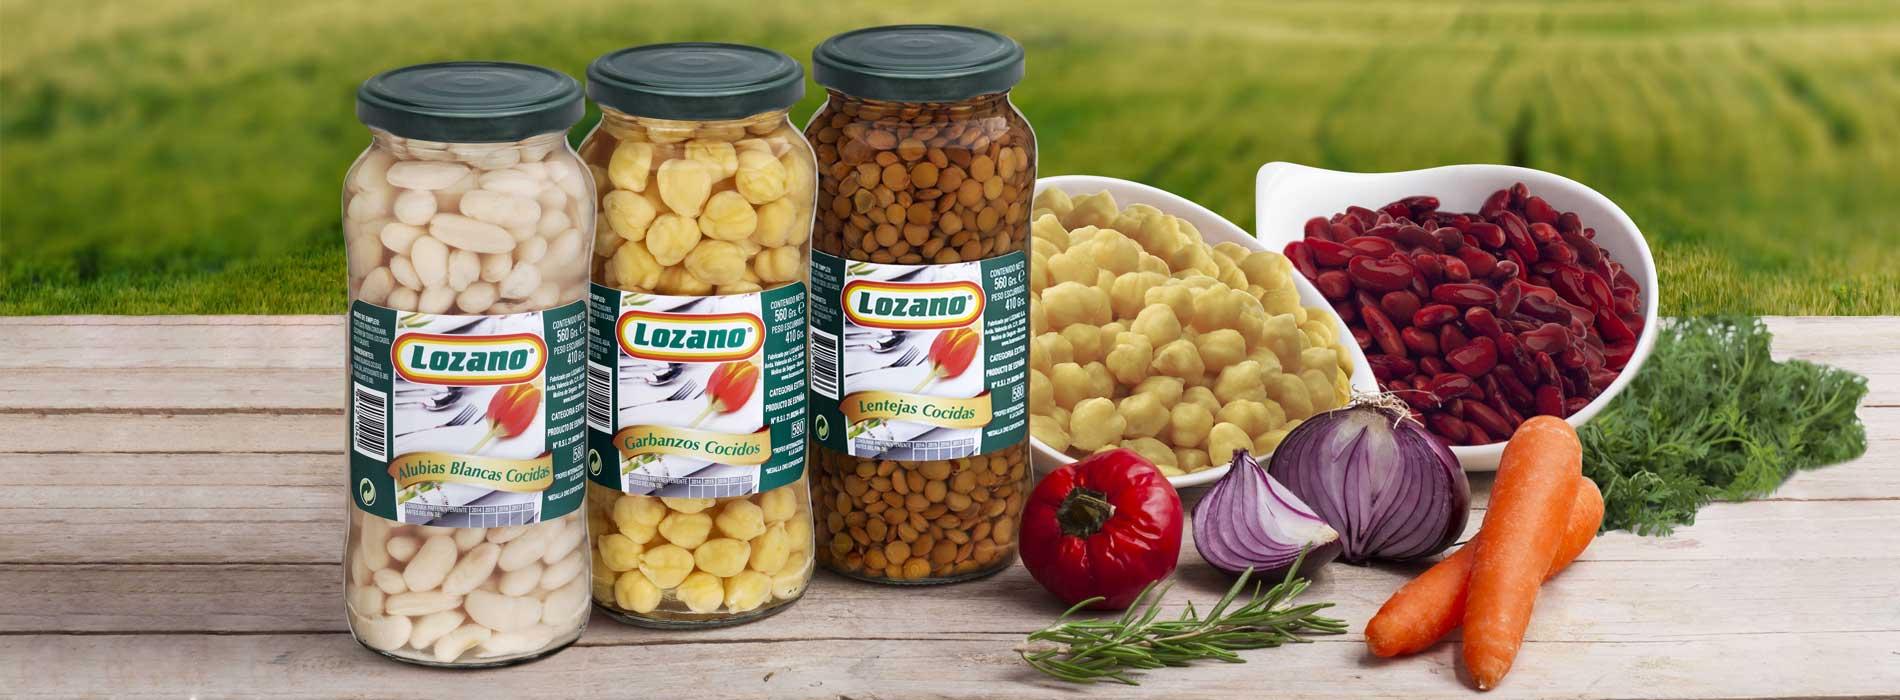 cooked-pulses-lozano